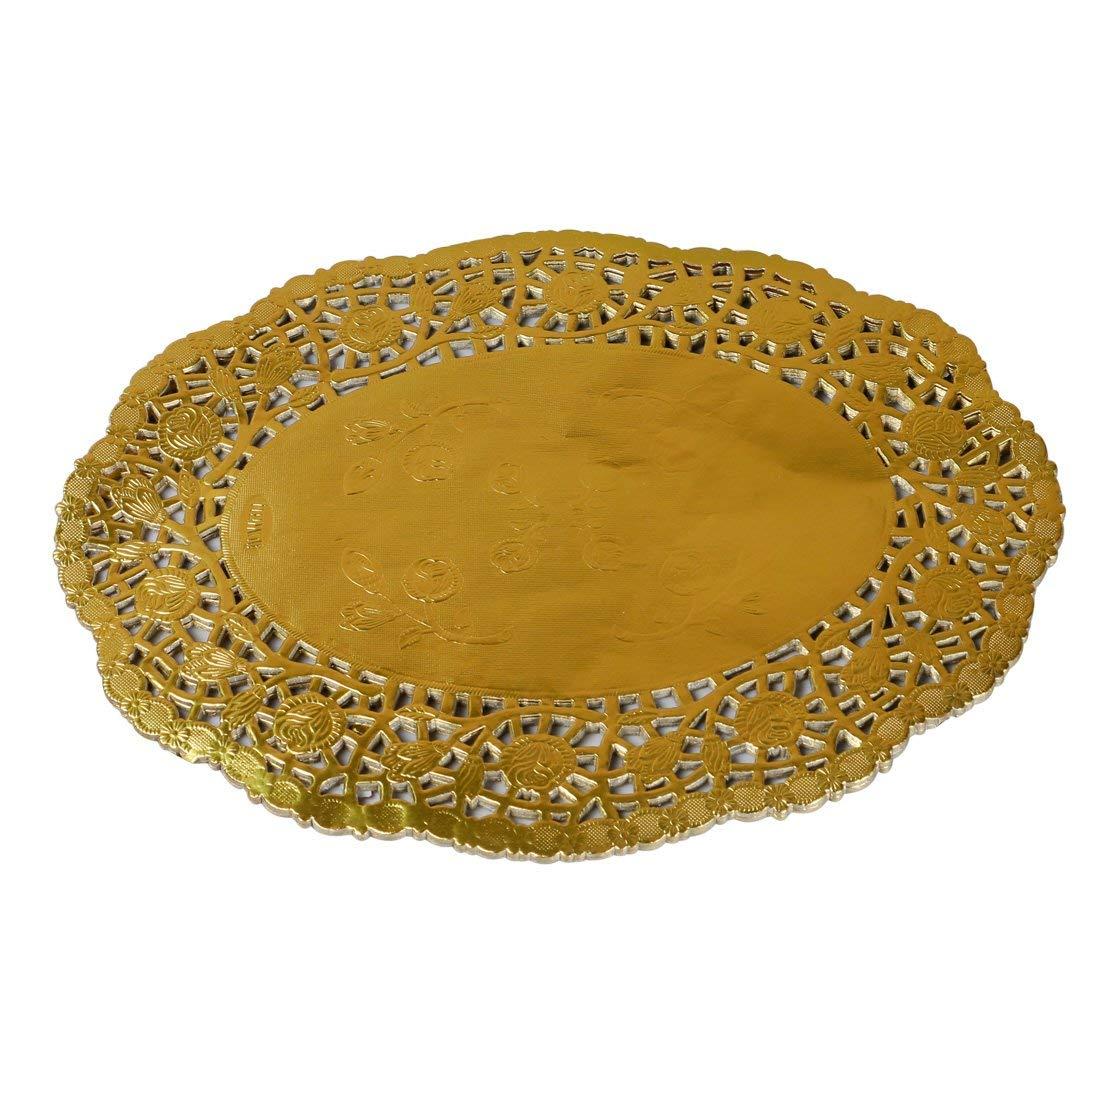 Heeler 40 Pcs Gold Lace Paper Doilies Gold Foil Oval Paper Doilies Cake Packaging Golden Paper Mat Doily 11.5 Inch